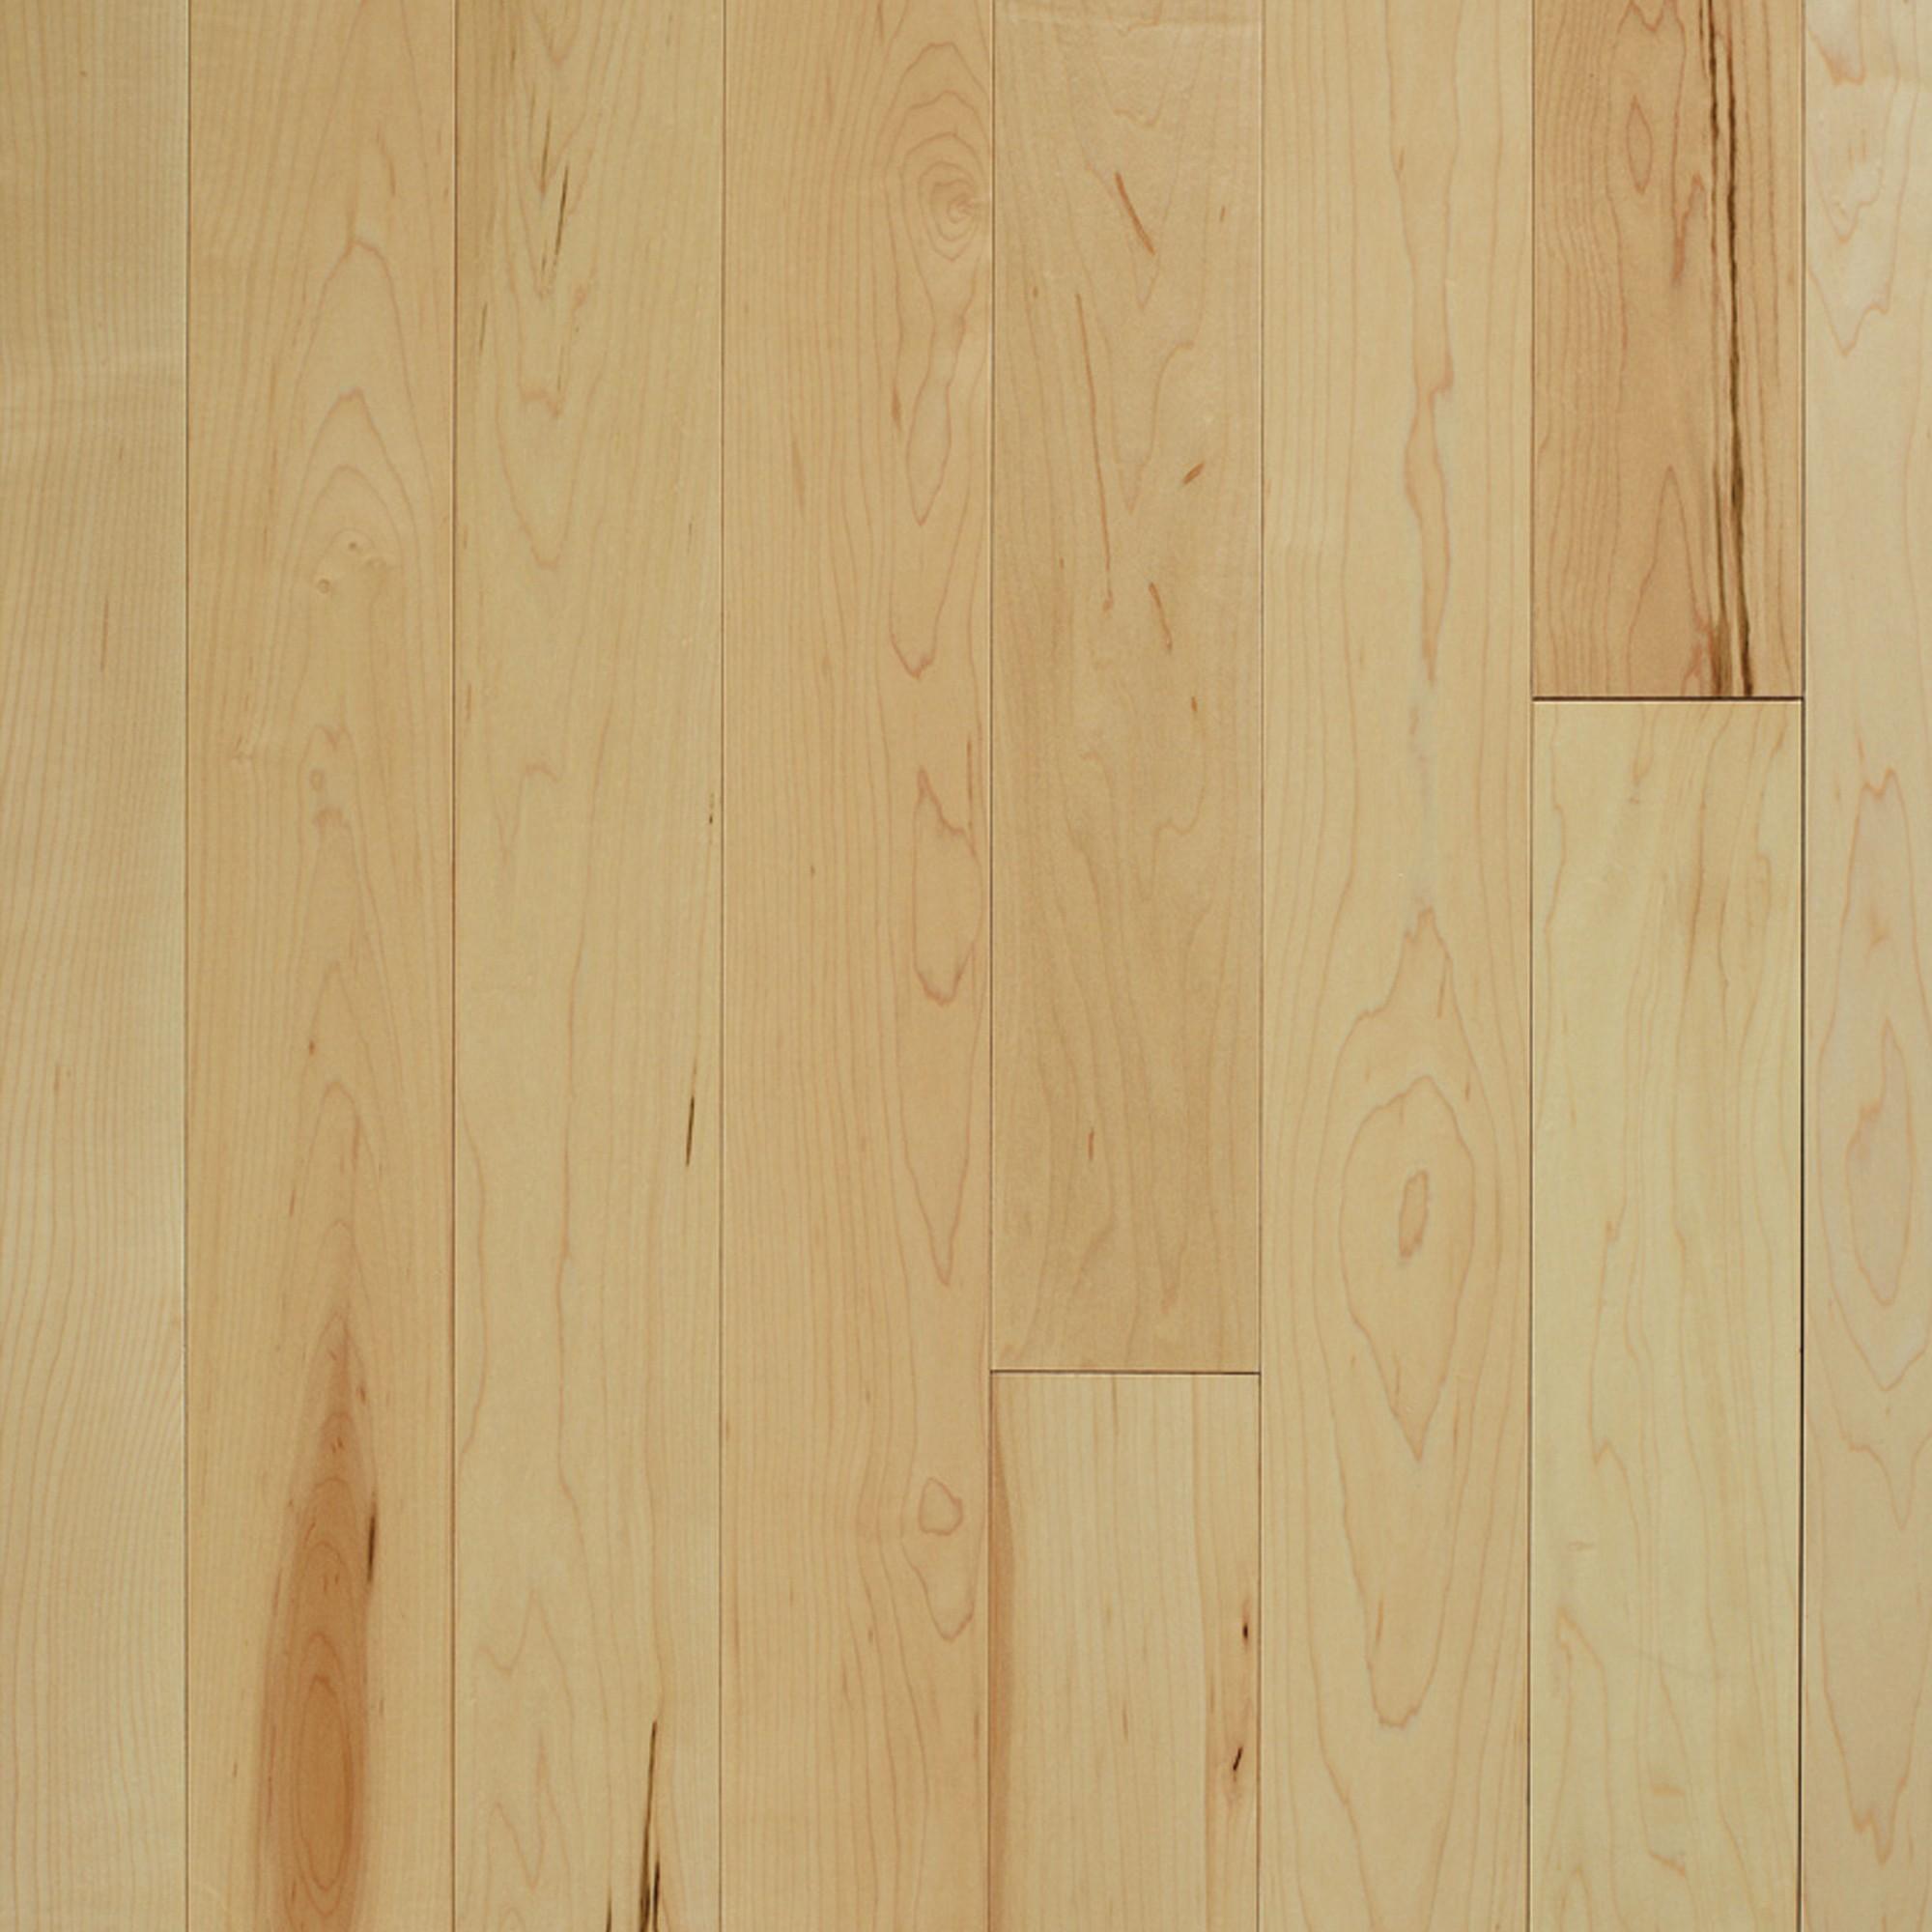 Smooth Maple Natural Vintage Hardwood Flooring